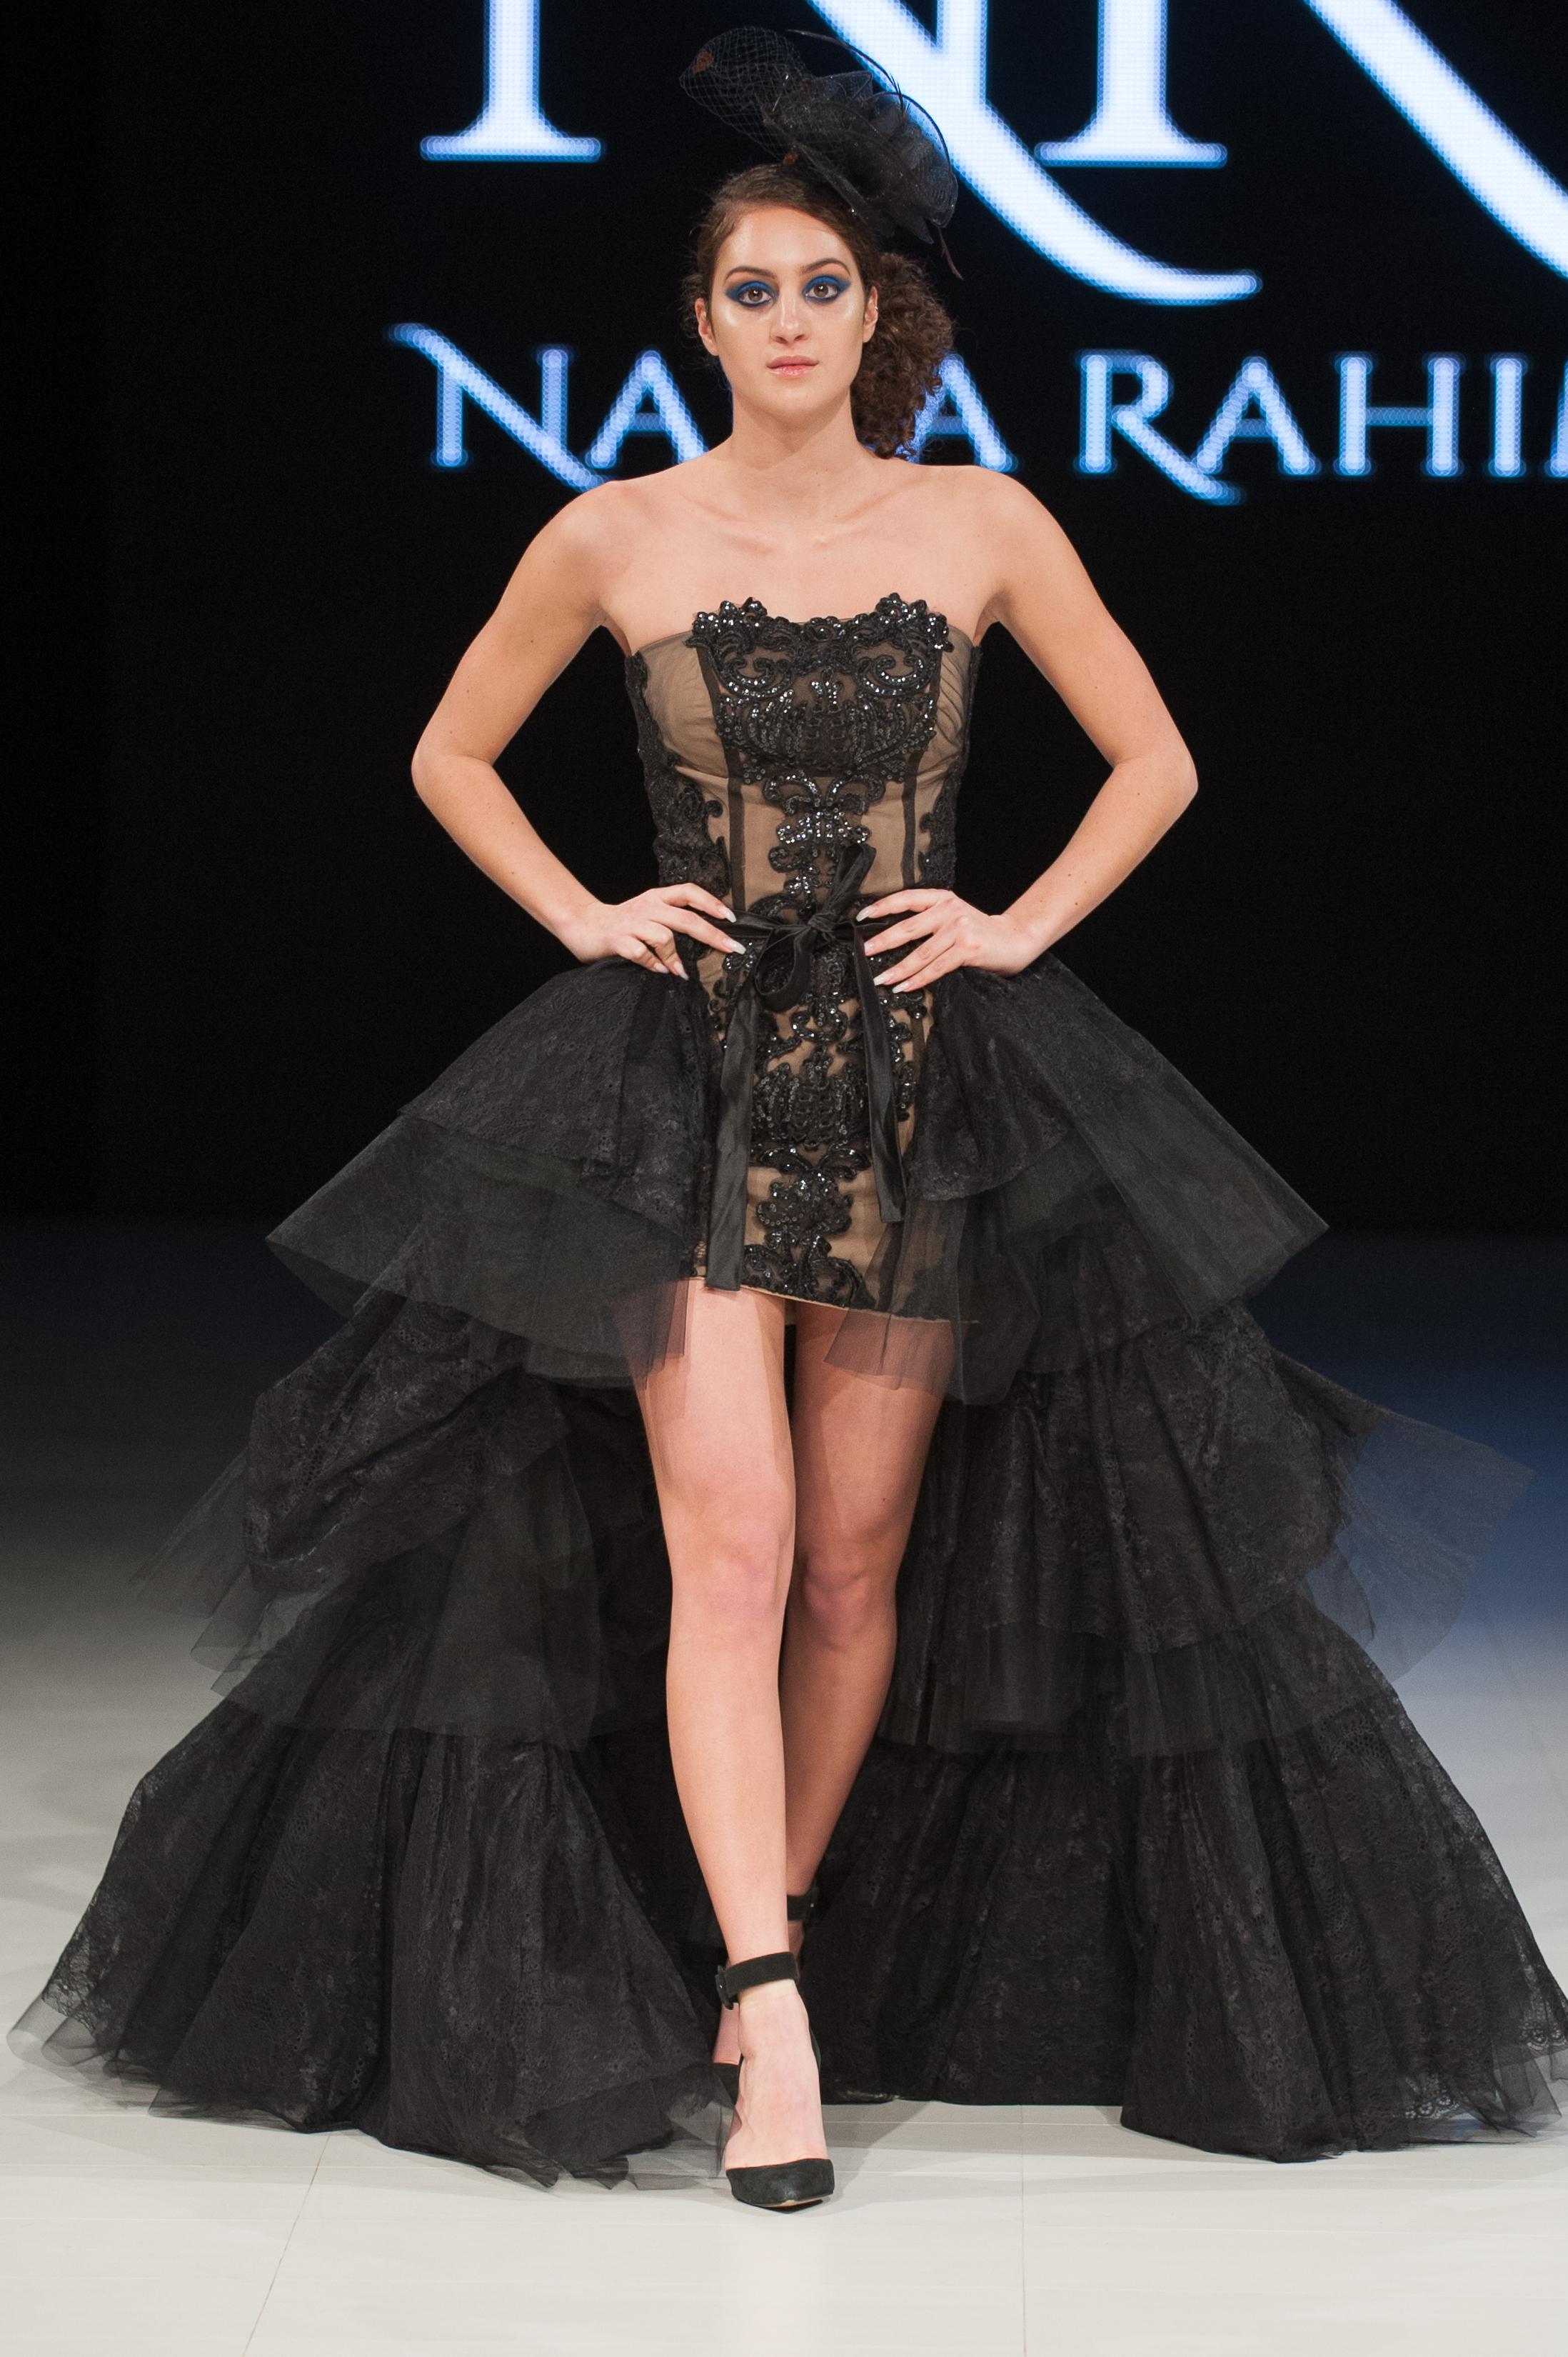 FAT2018-Day1-April17-Najla_Rahimi-Runway-Che_Rosales-LARAWAN-5759.jpg